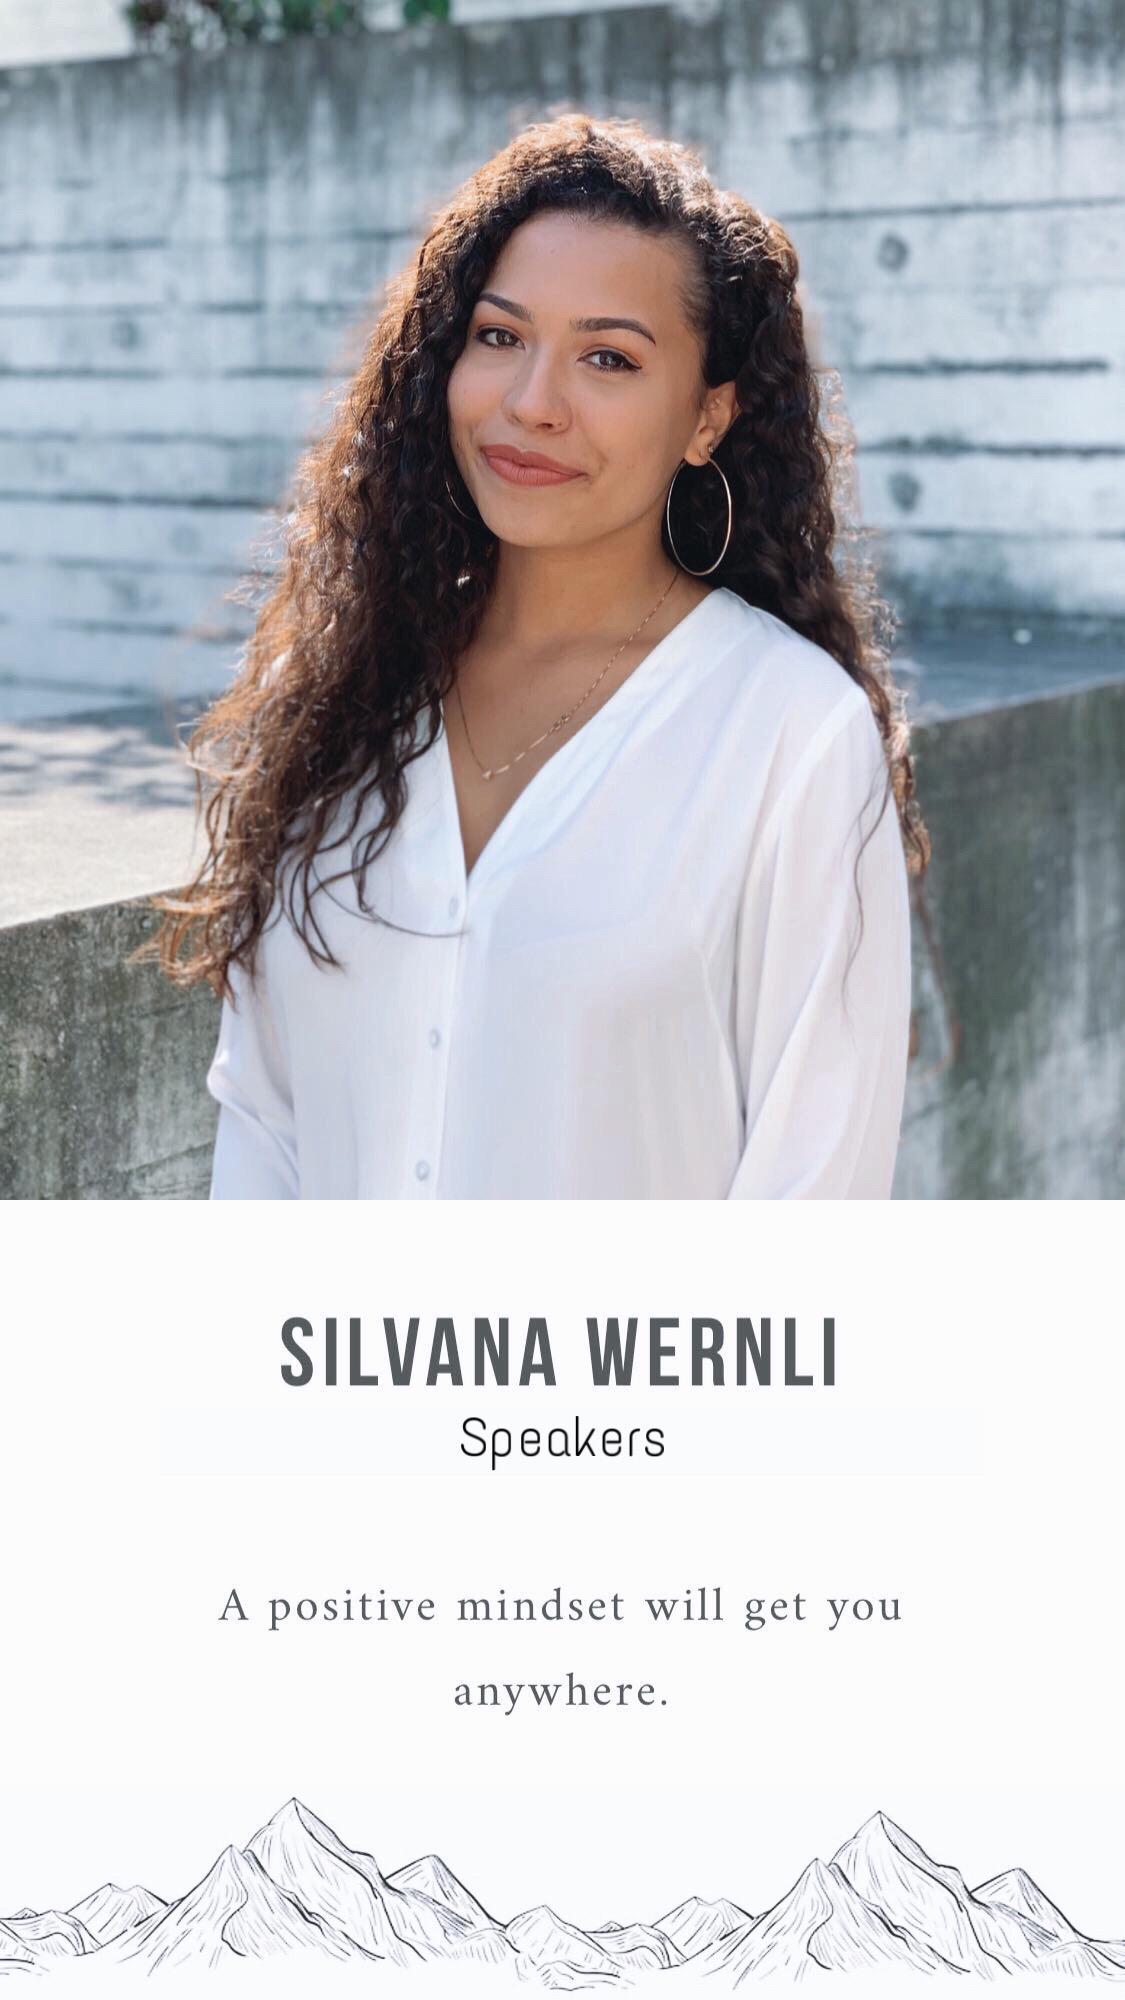 Speakers, SIlvana Wernli.jpg